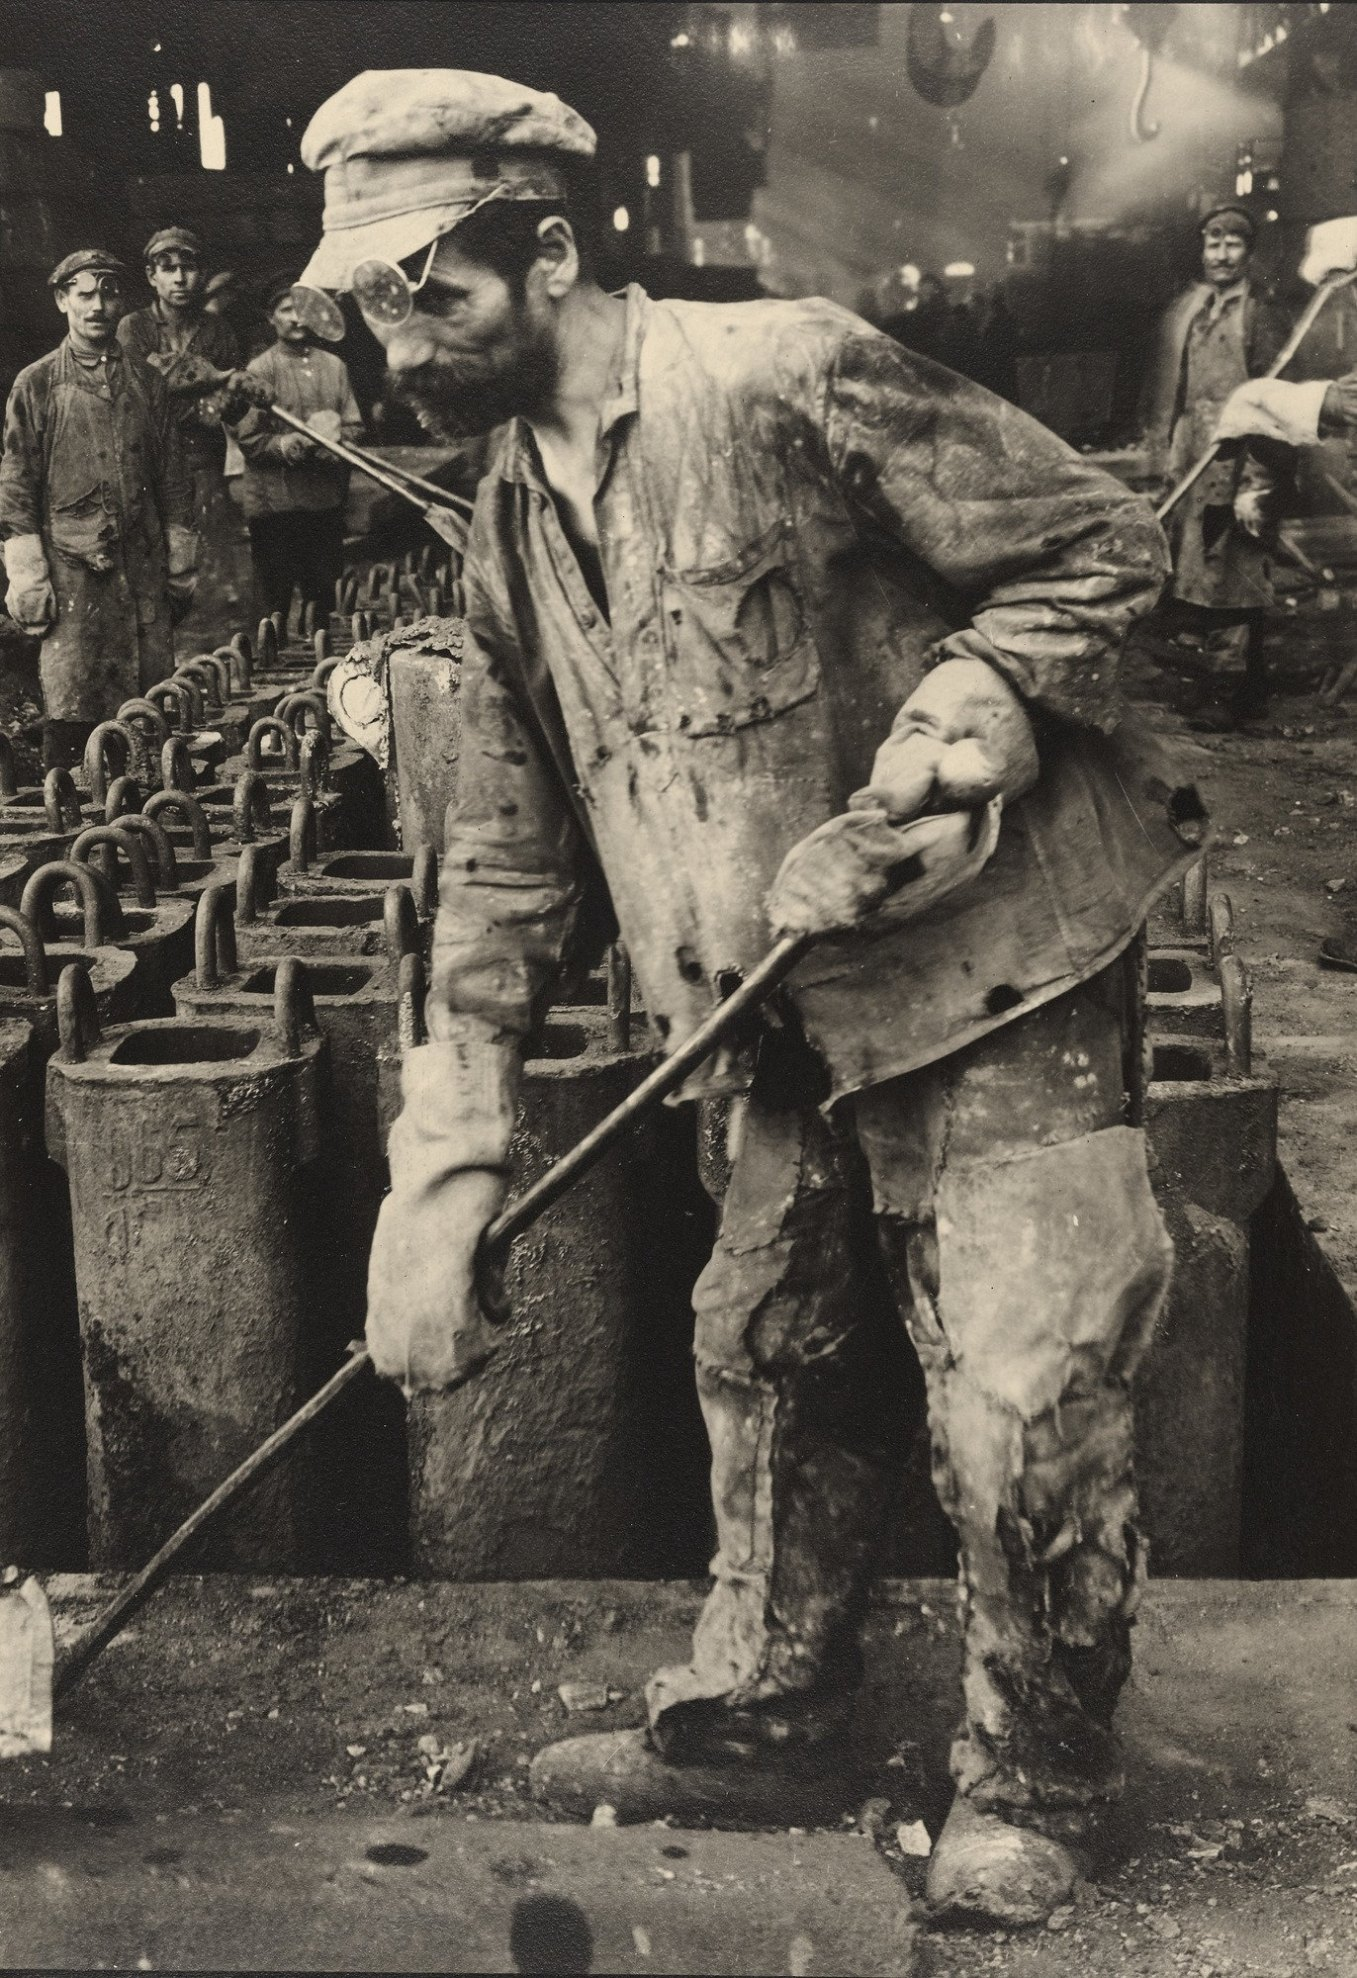 margaret-bourke-white-iron-puddler-red-october-rolling-mills-stalingrad-1930.jpg